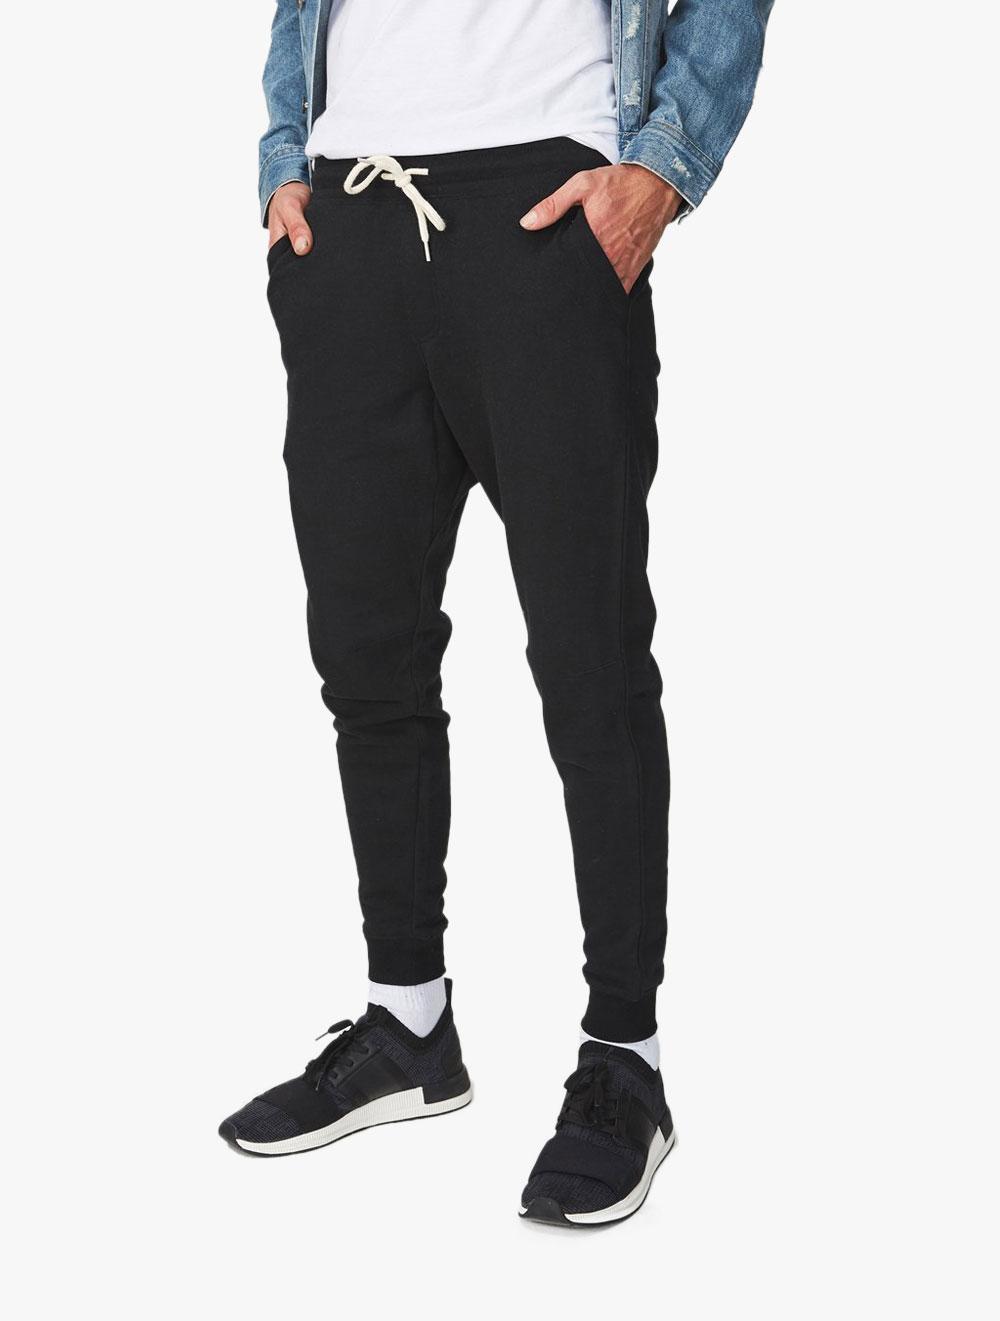 40f005d7889 Shop The Latest Men s Sportswear - Branded   Original